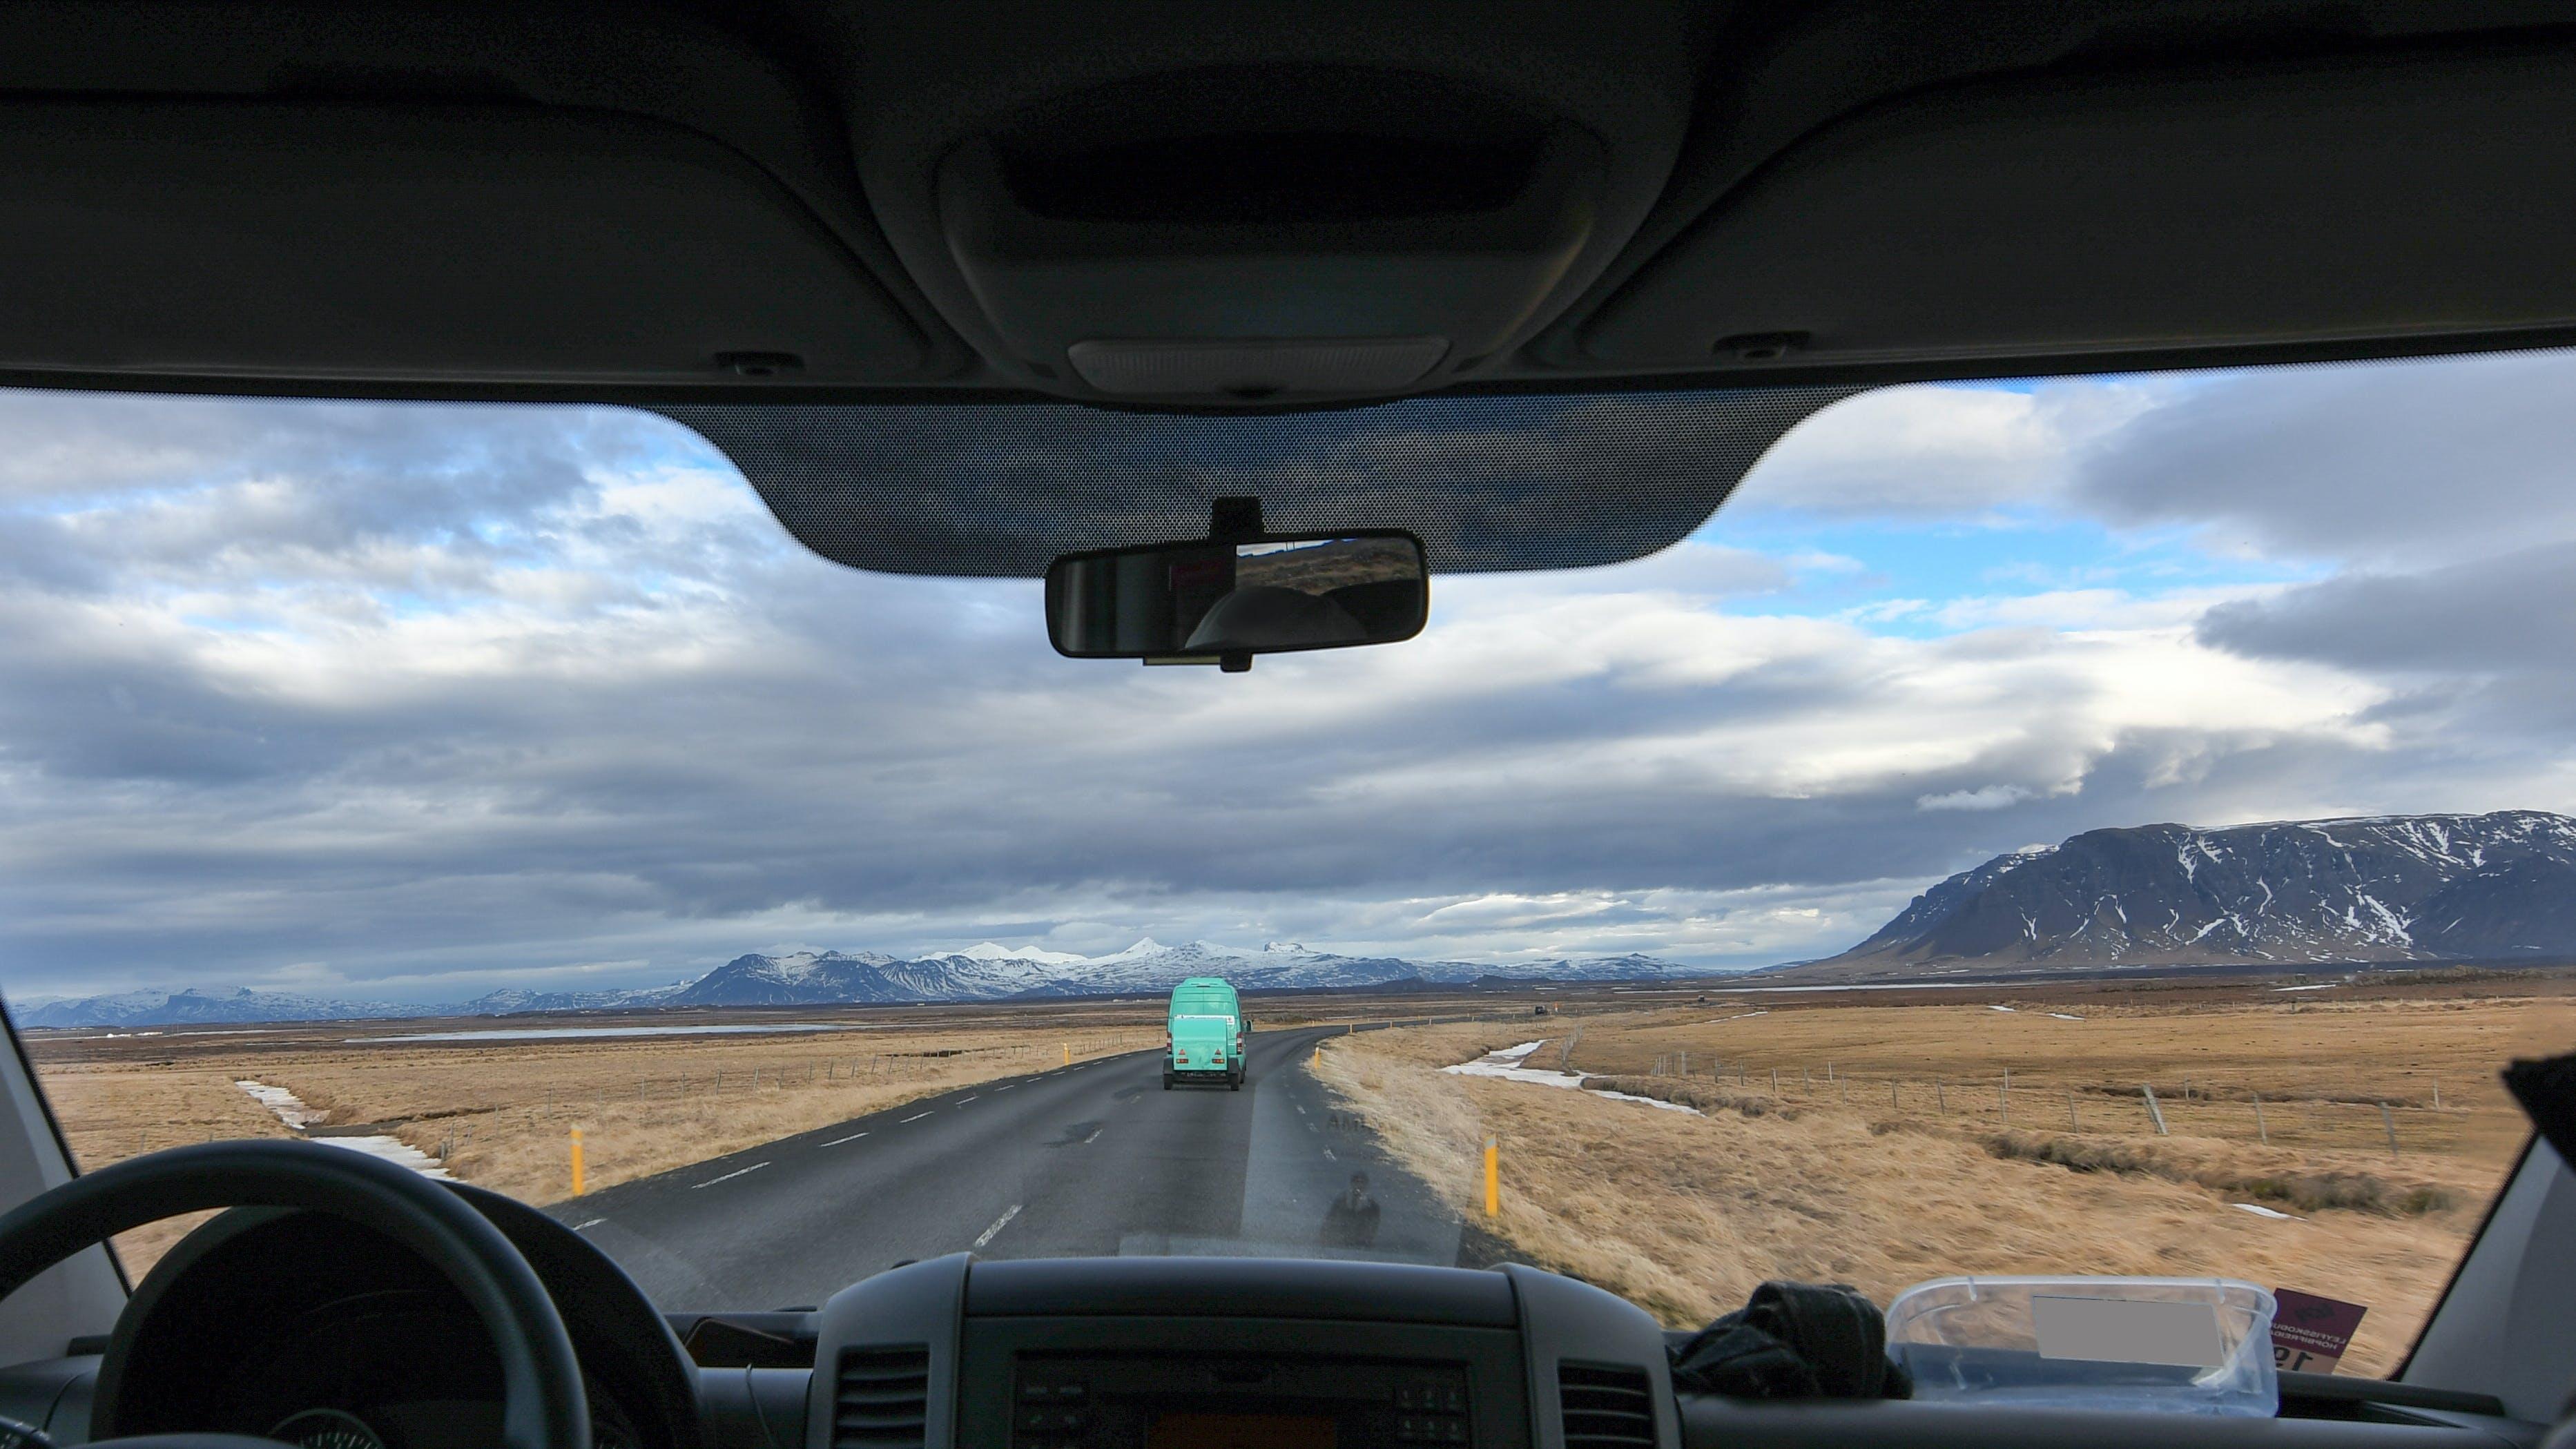 Free stock photo of adventure, asphalt, background, beautiful